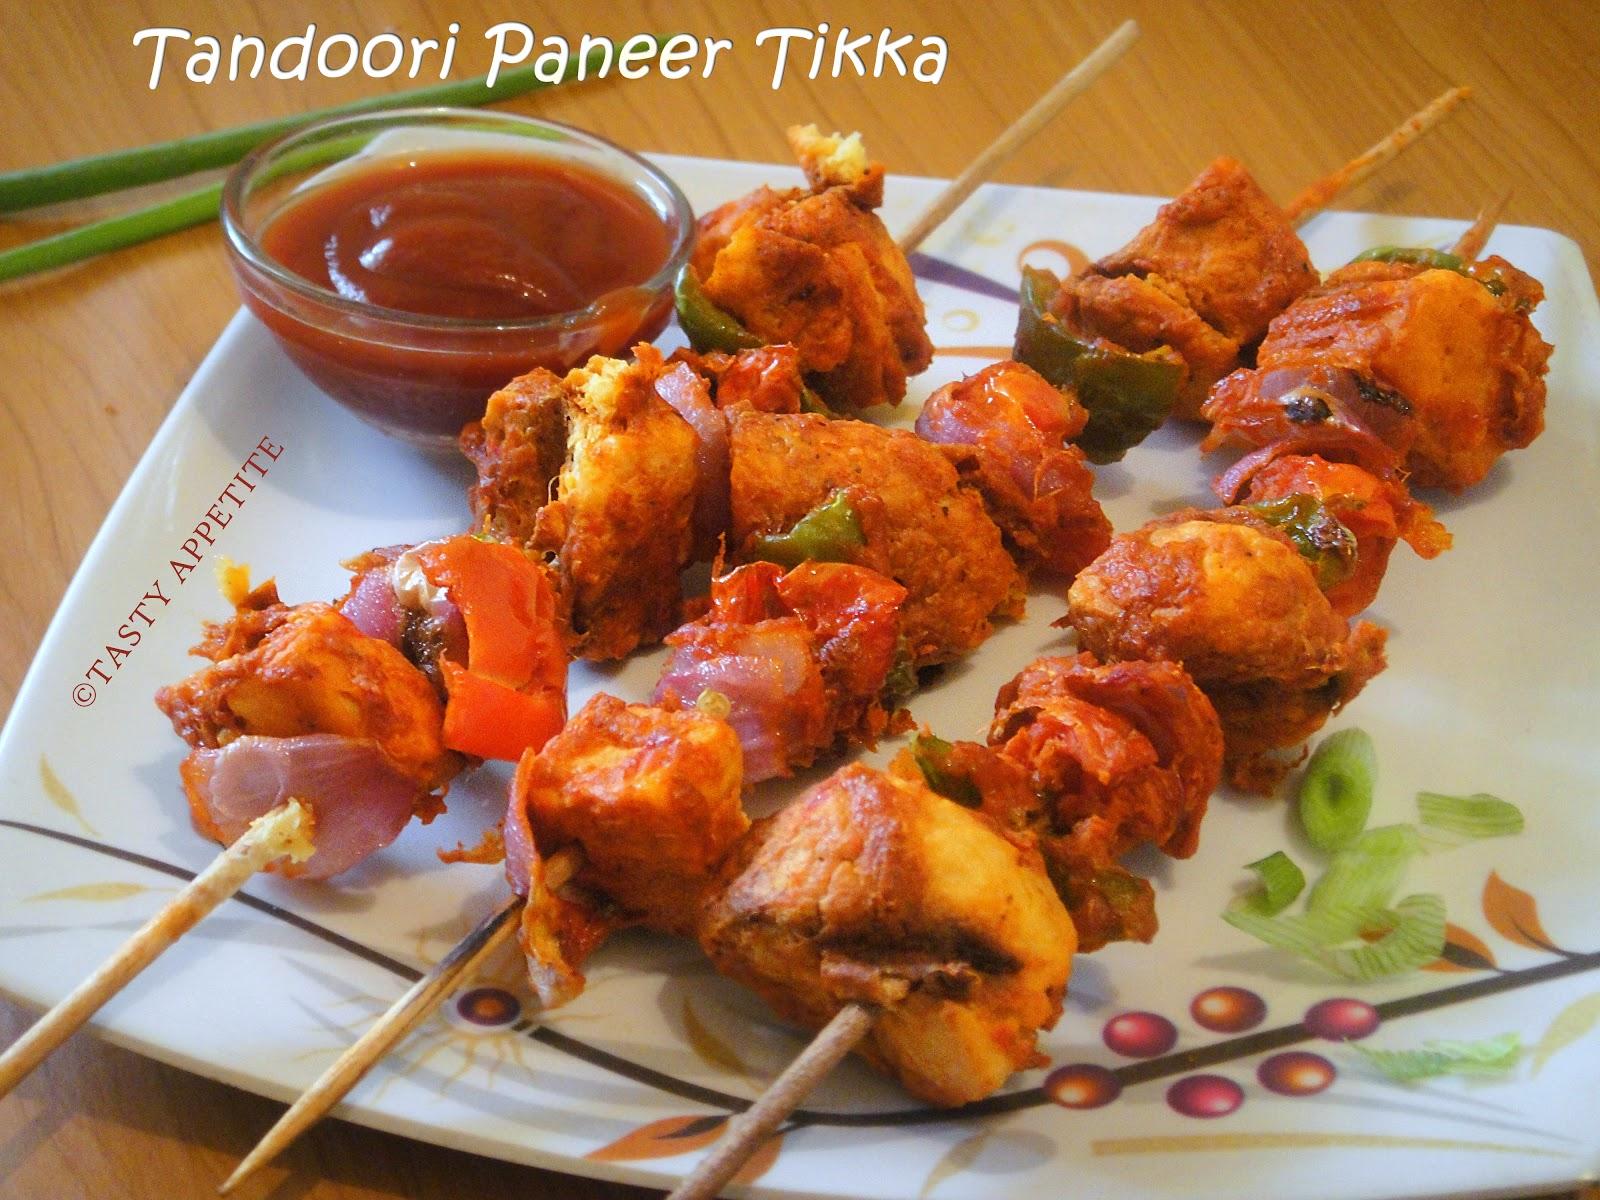 How to make paneer tikka at home tandoori paneer tikka step by how to make paneer tikka at home tandoori paneer tikka step by step forumfinder Gallery